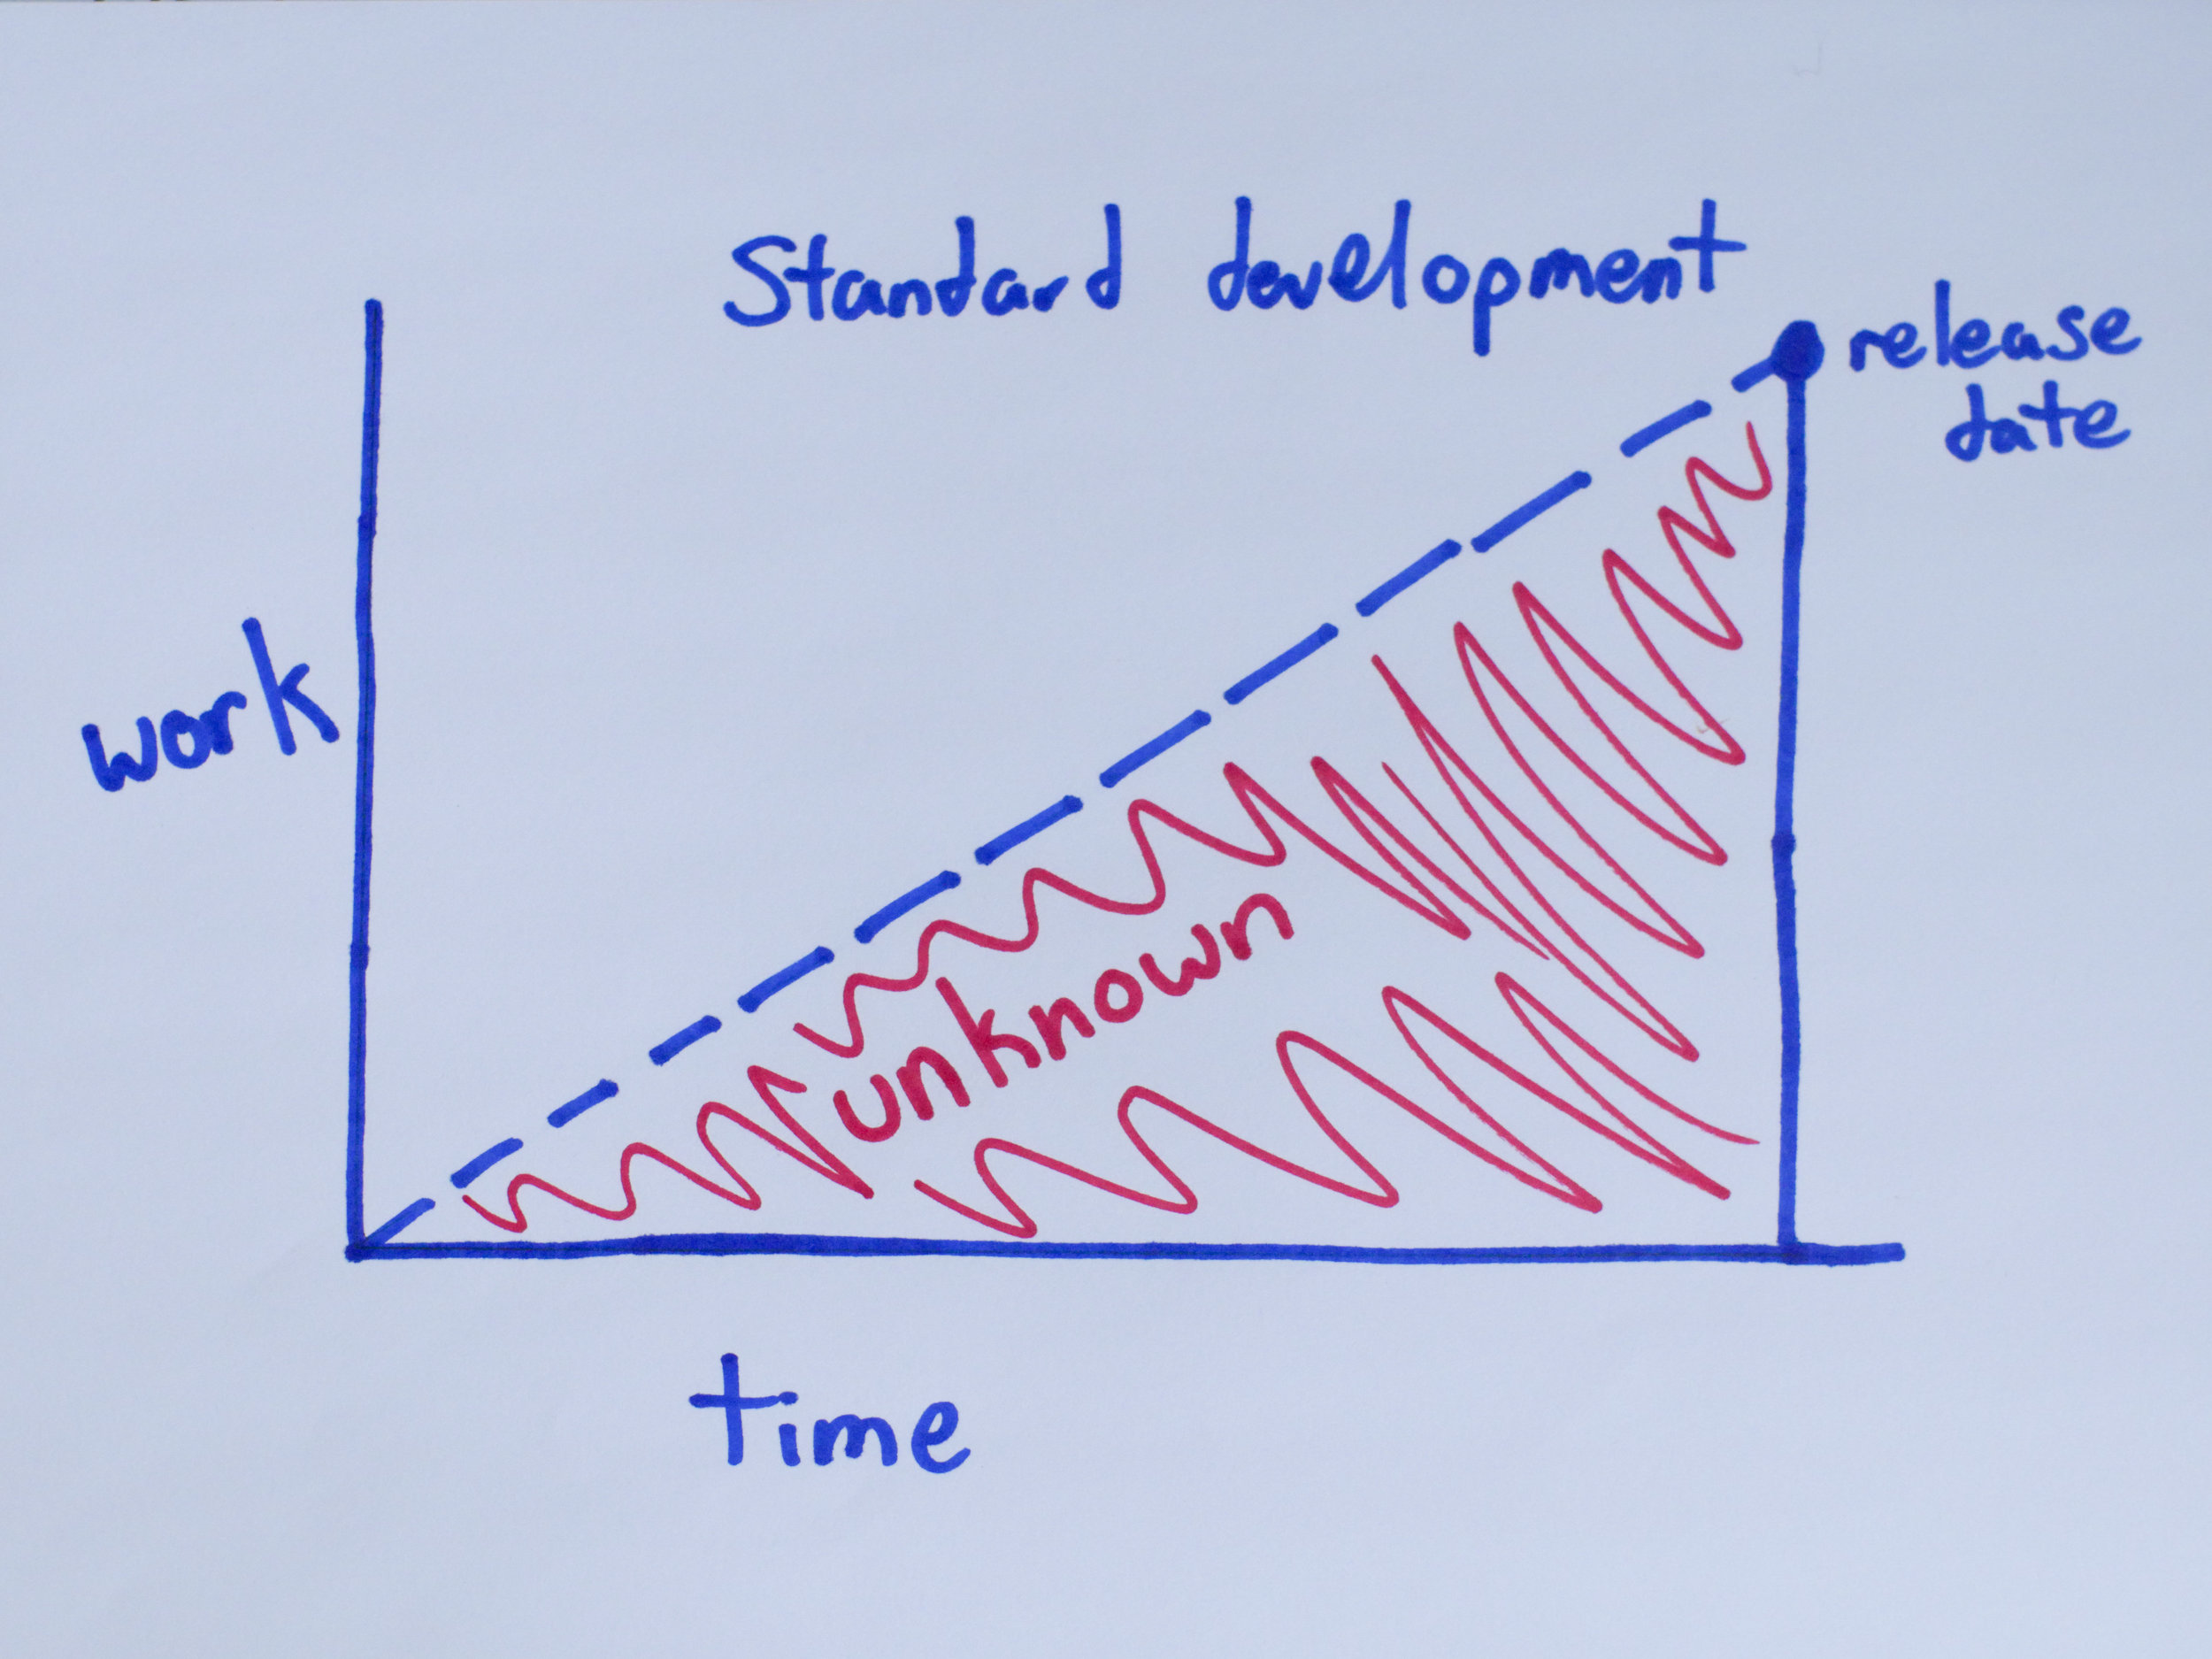 Standard-development-graph.jpg